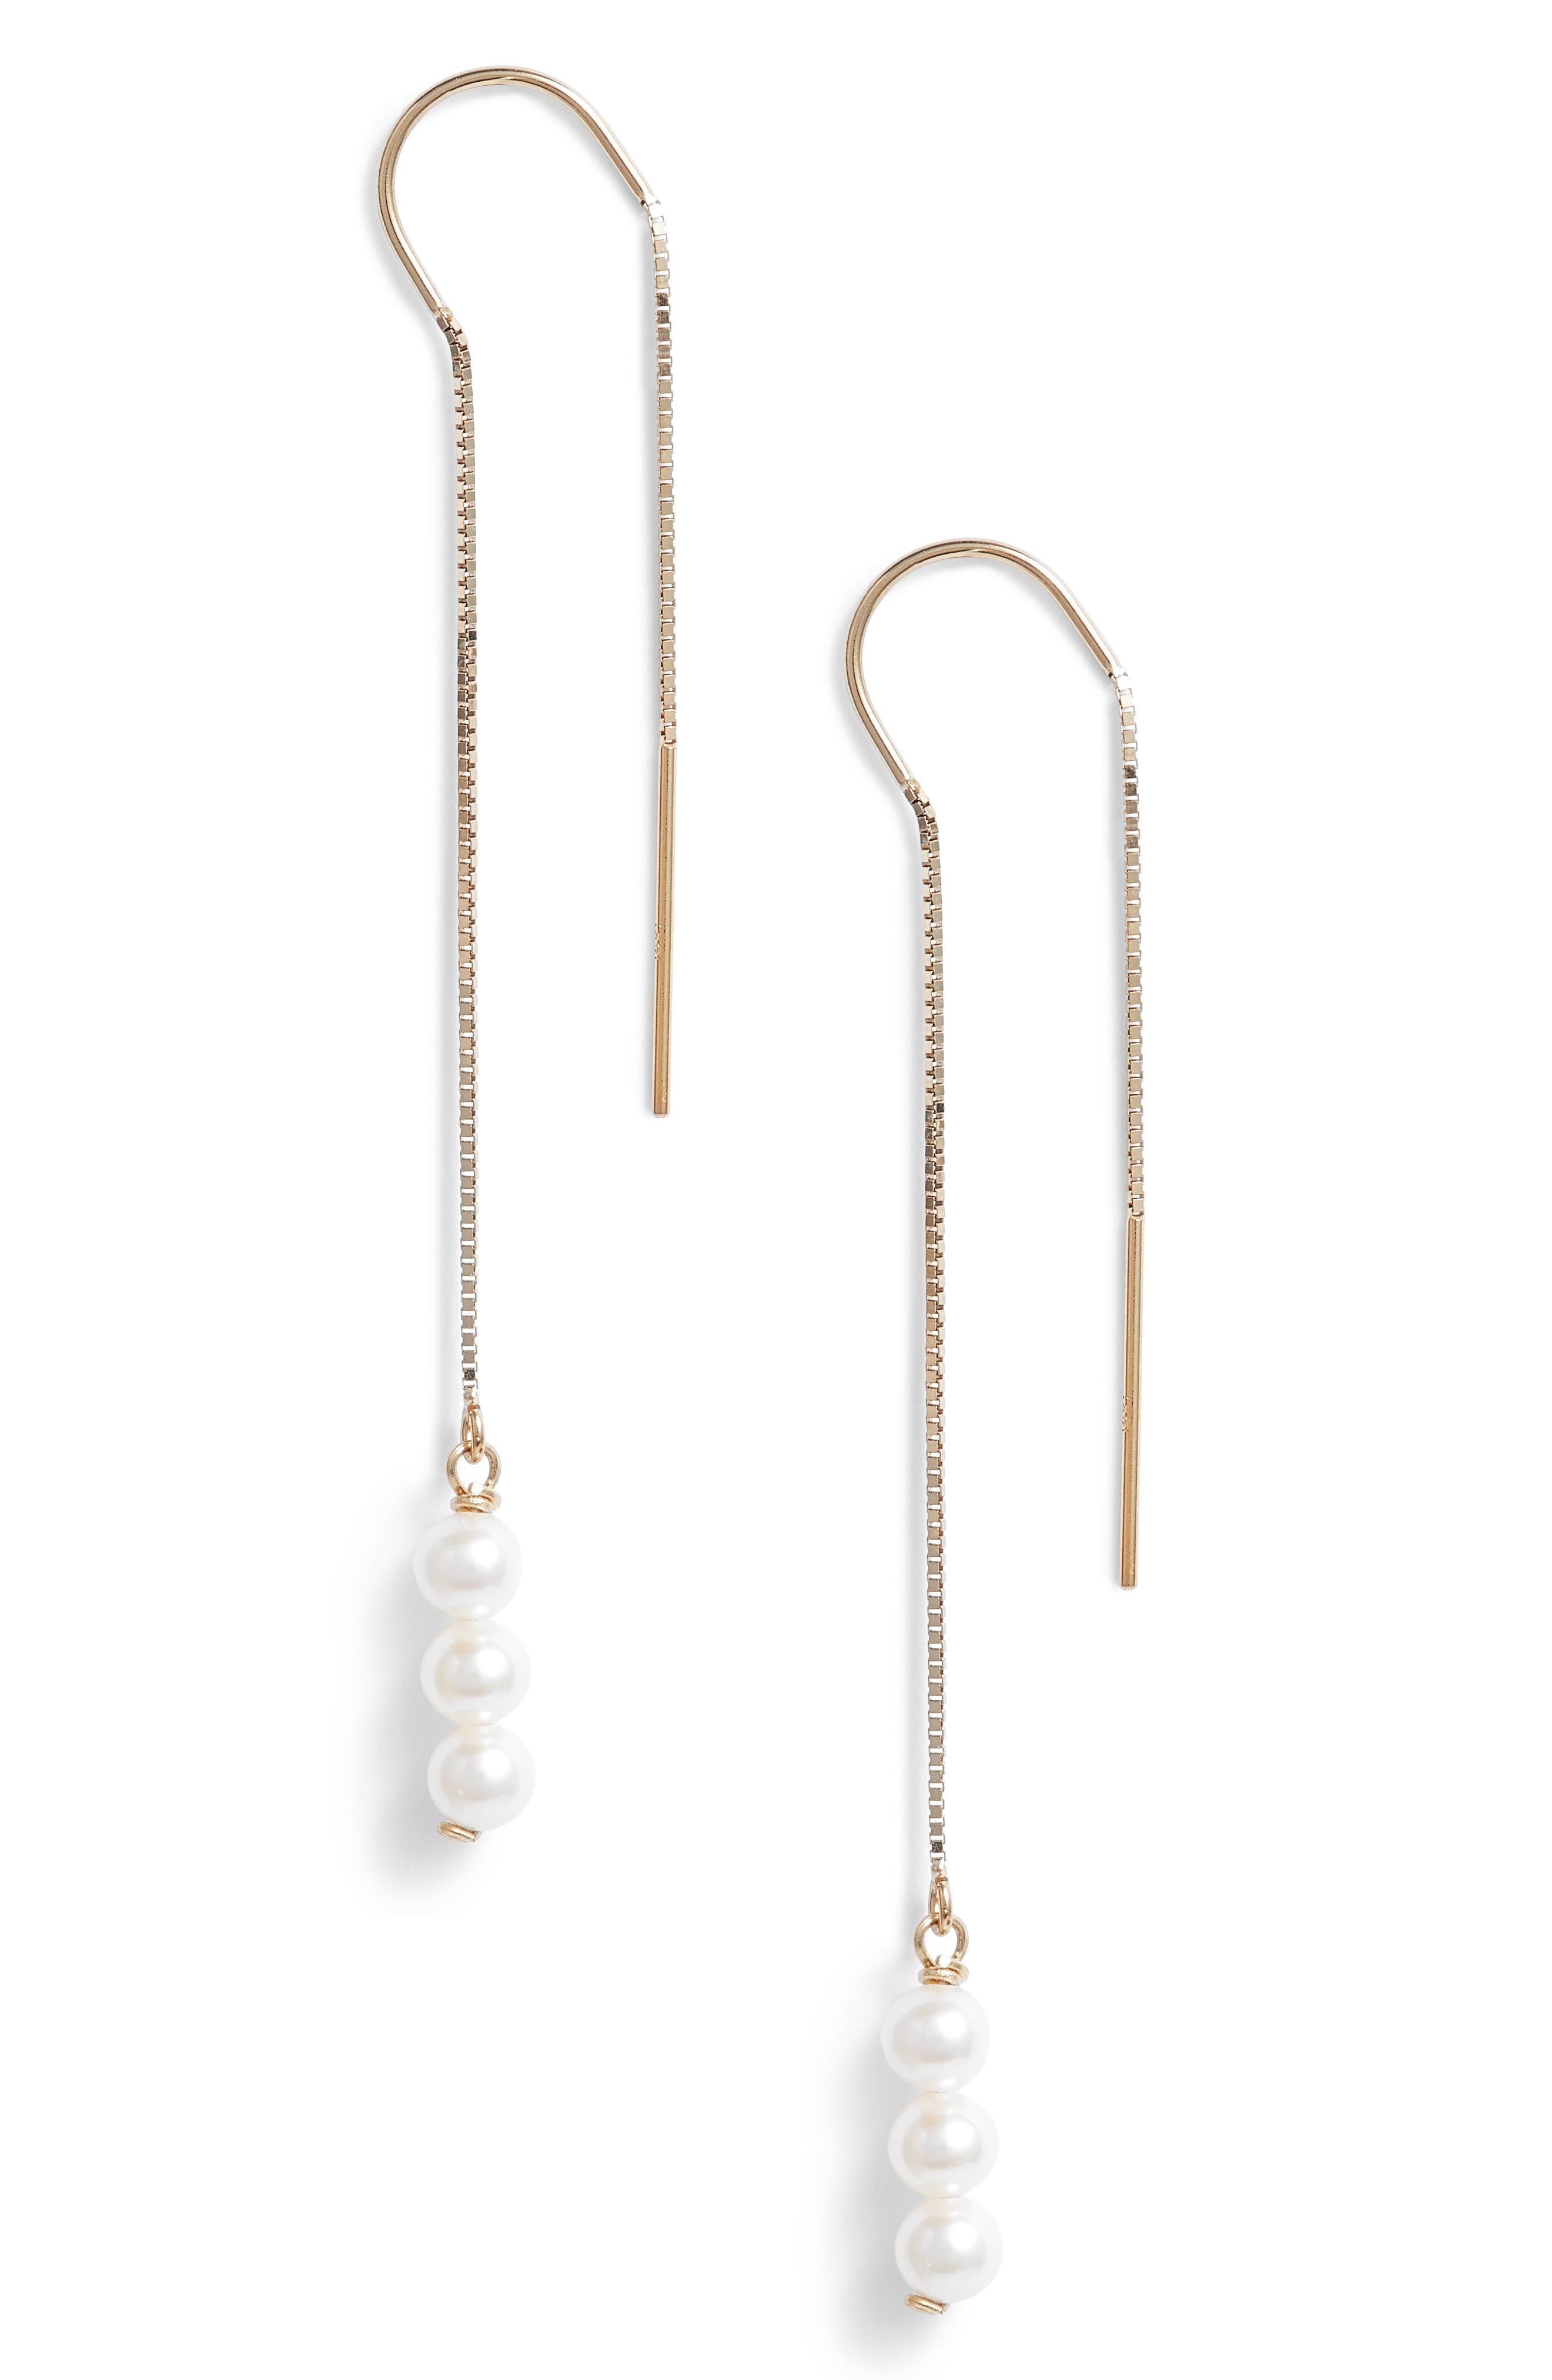 Triple Baby Pearl Threader Earrings,                             Main thumbnail 1, color,                             710